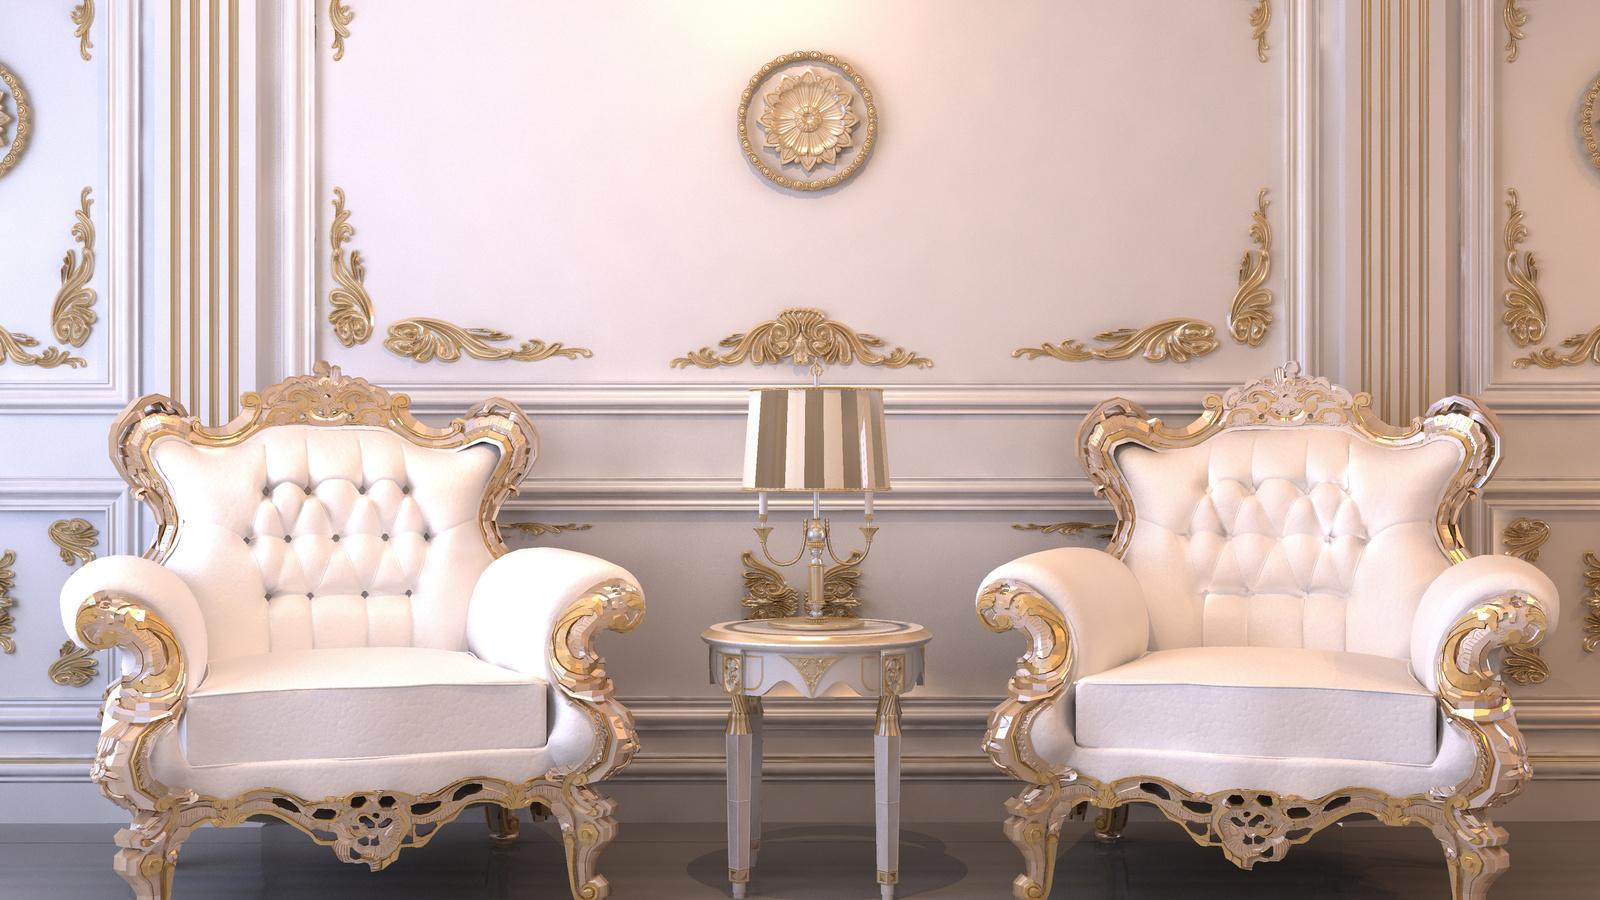 кресла, Интерьер, комната